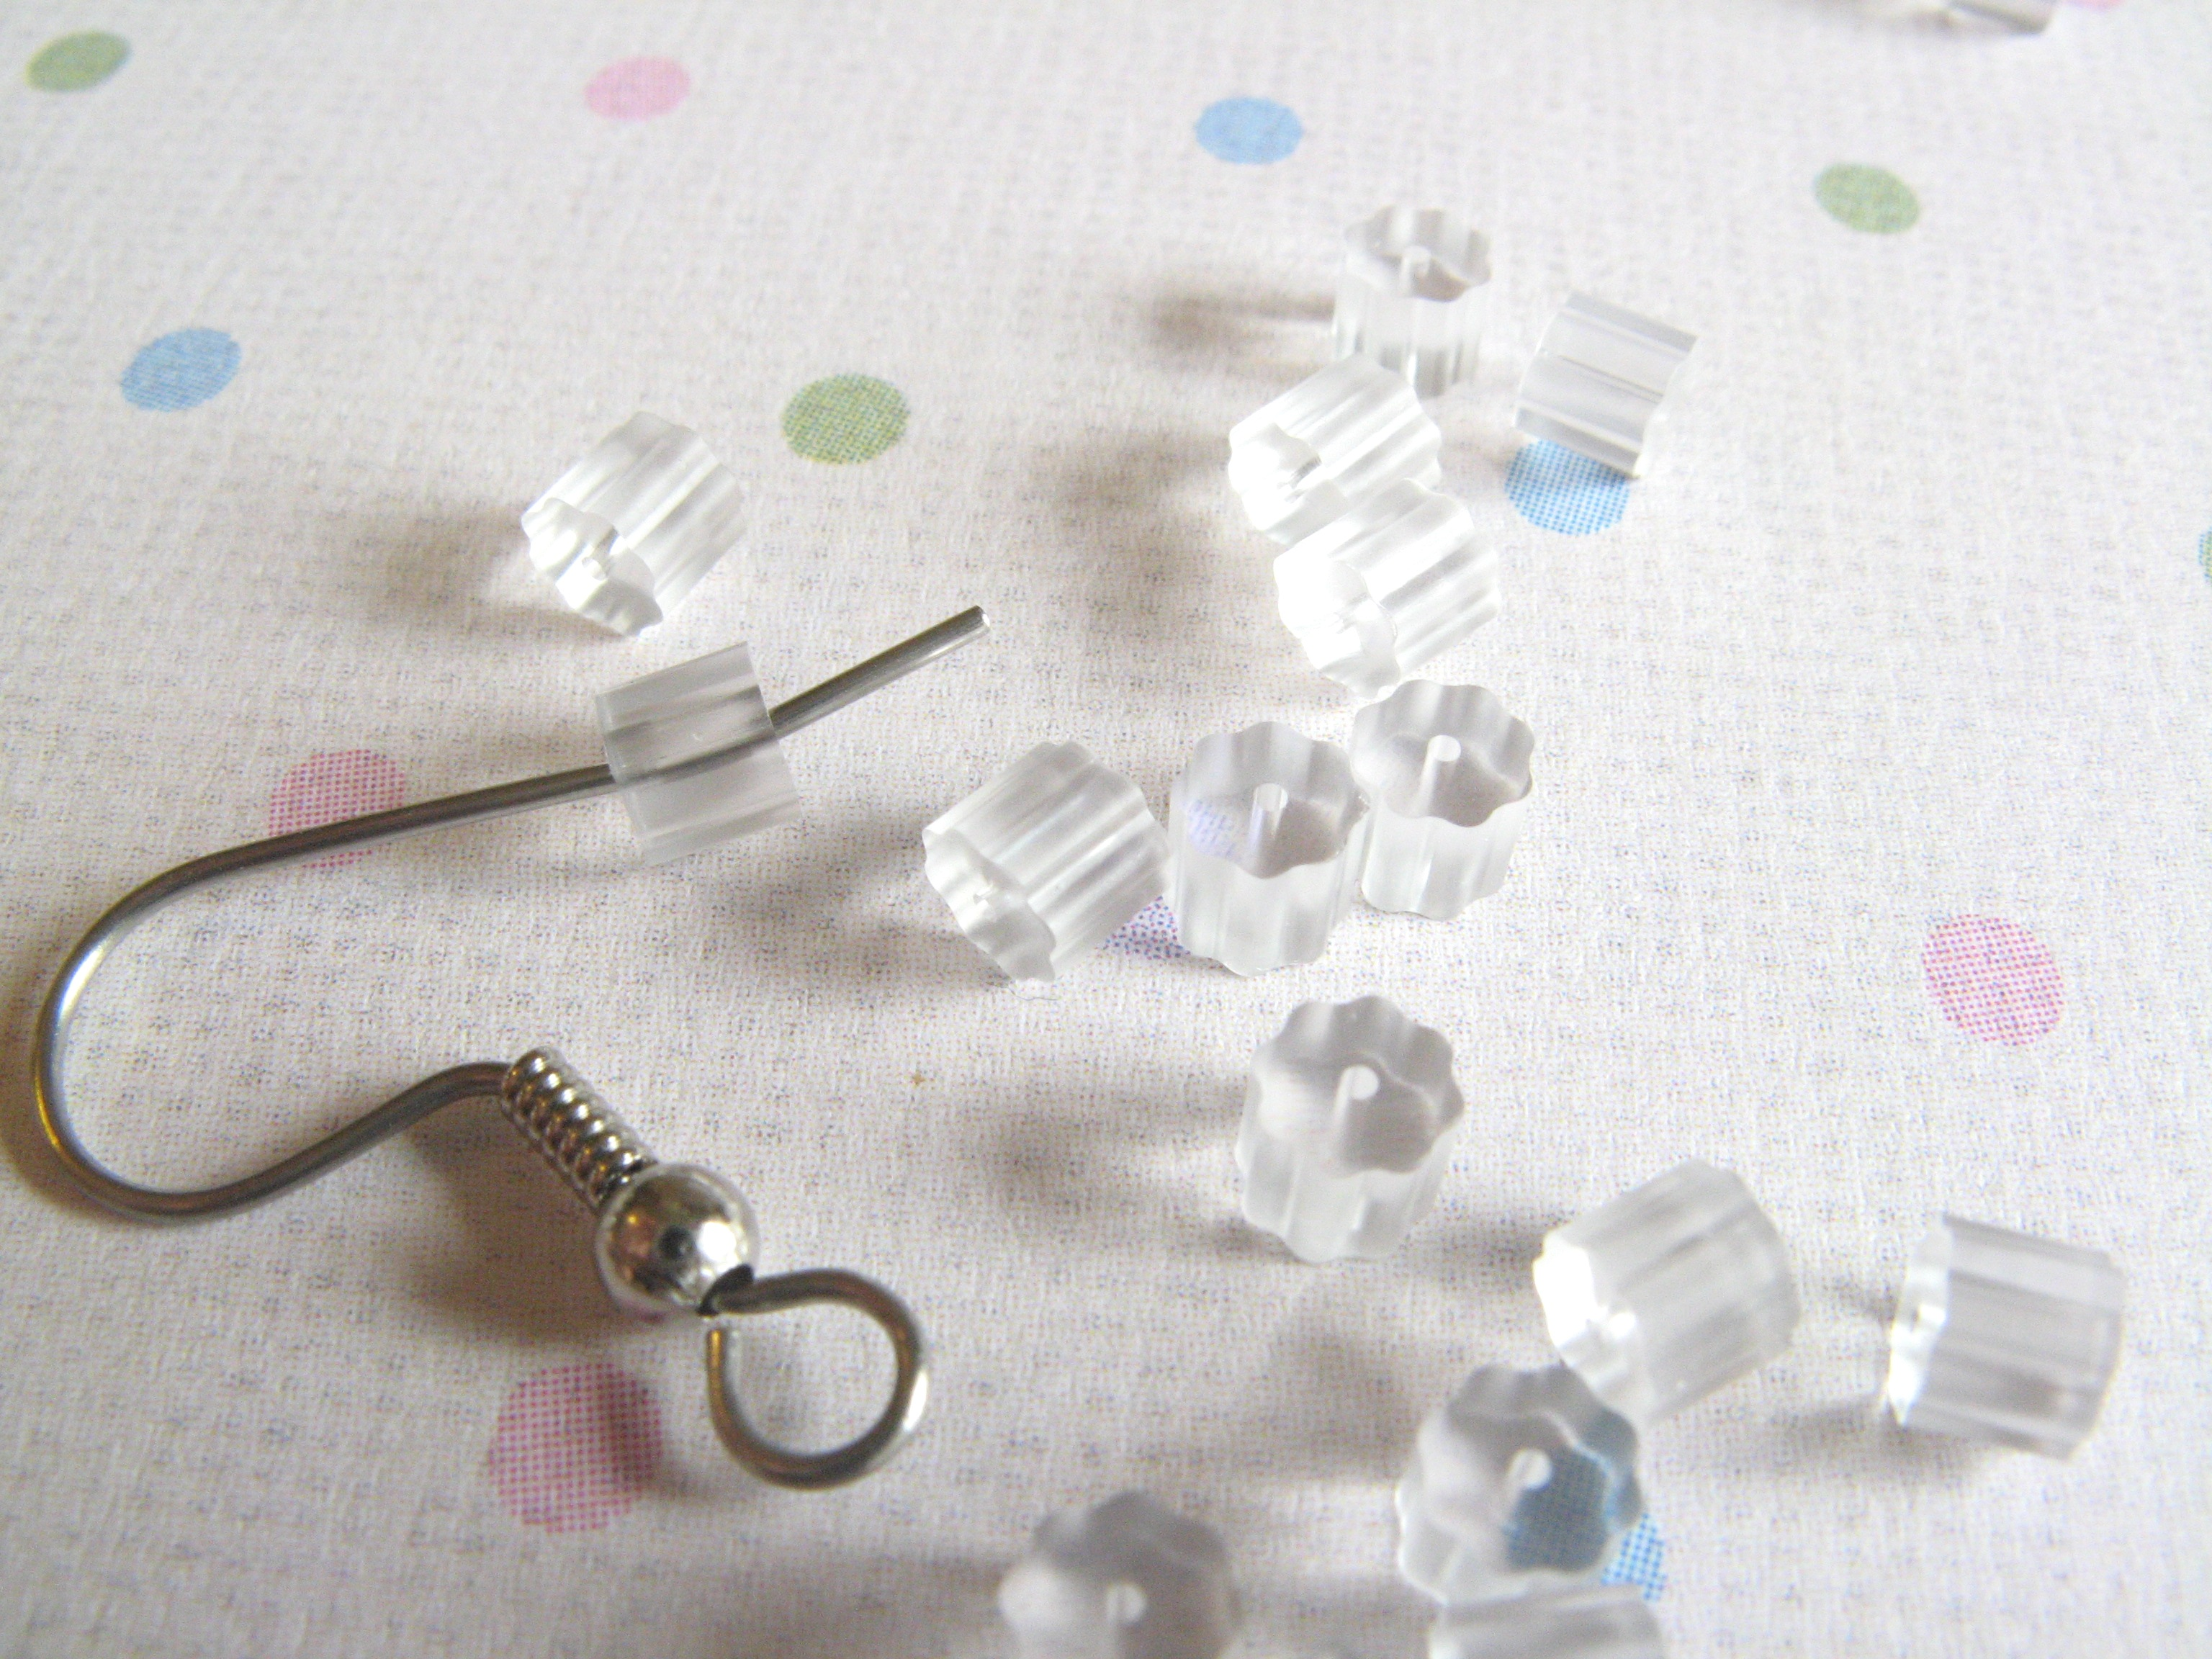 100 Clear Plastic Rubber French Hook Earring Backs On Luulla